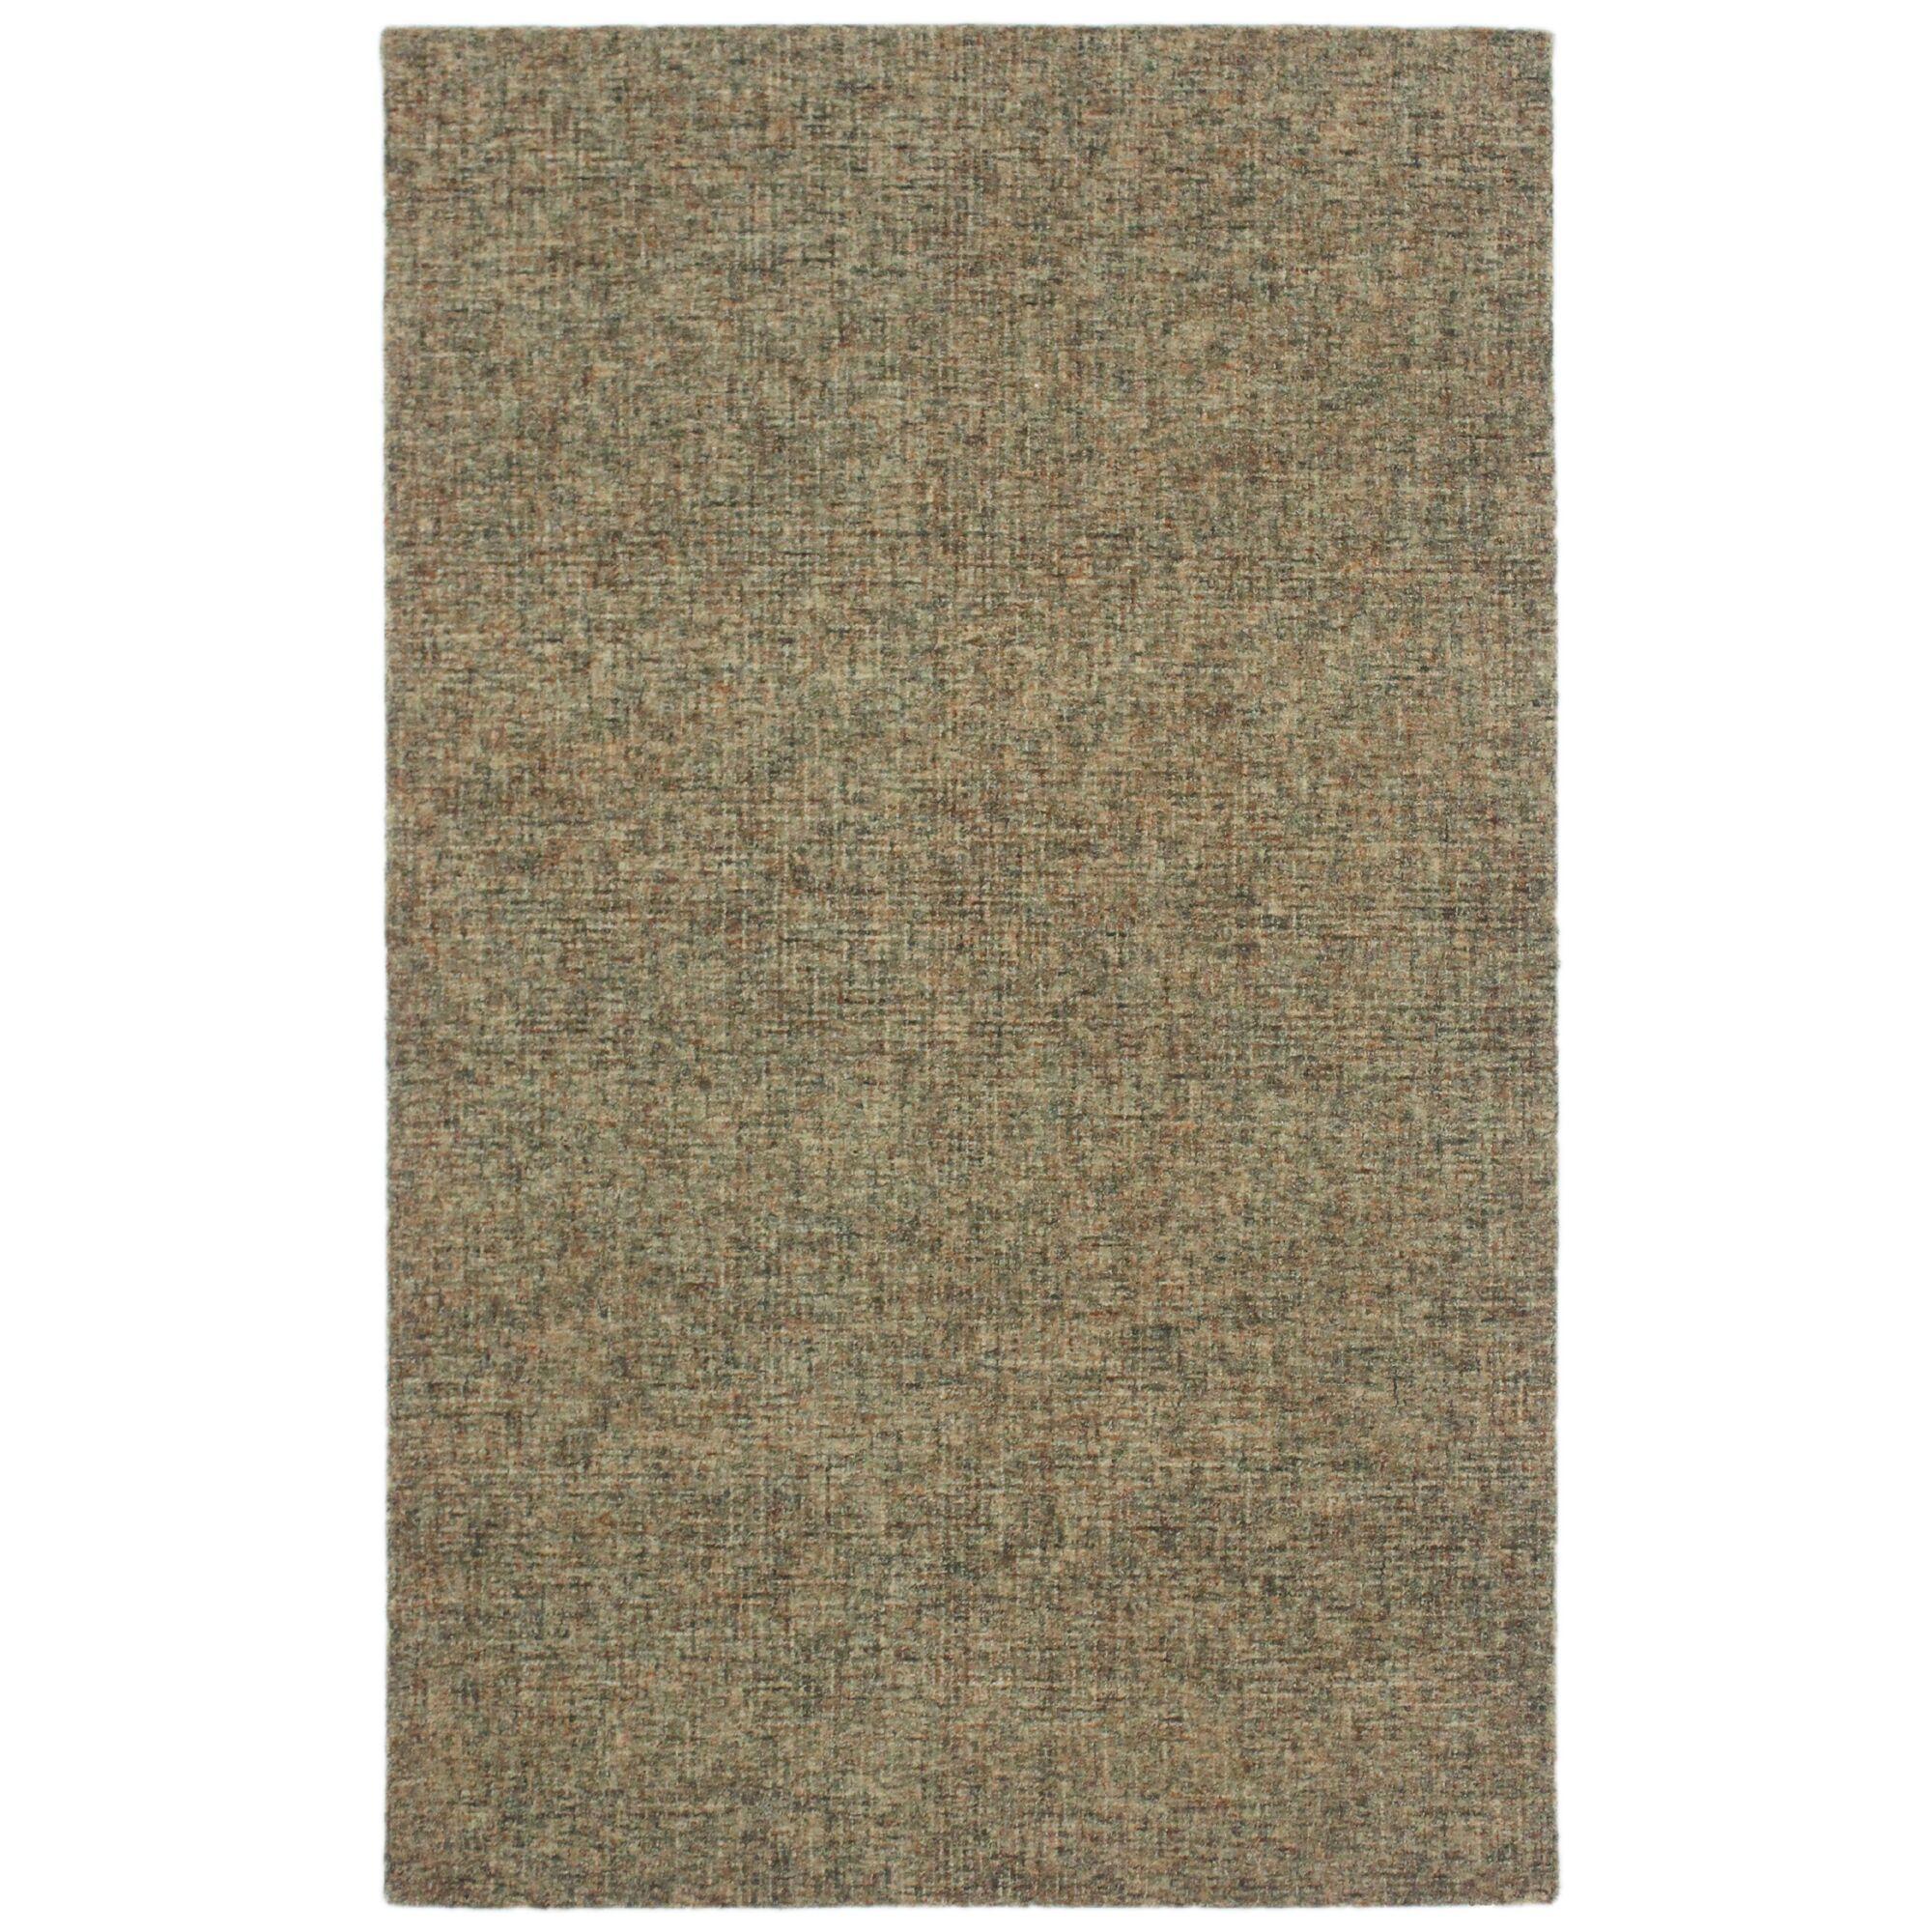 Hunsberger Hand-Woven Wool Khaki Area Rug Rug Size: Runner 2'3